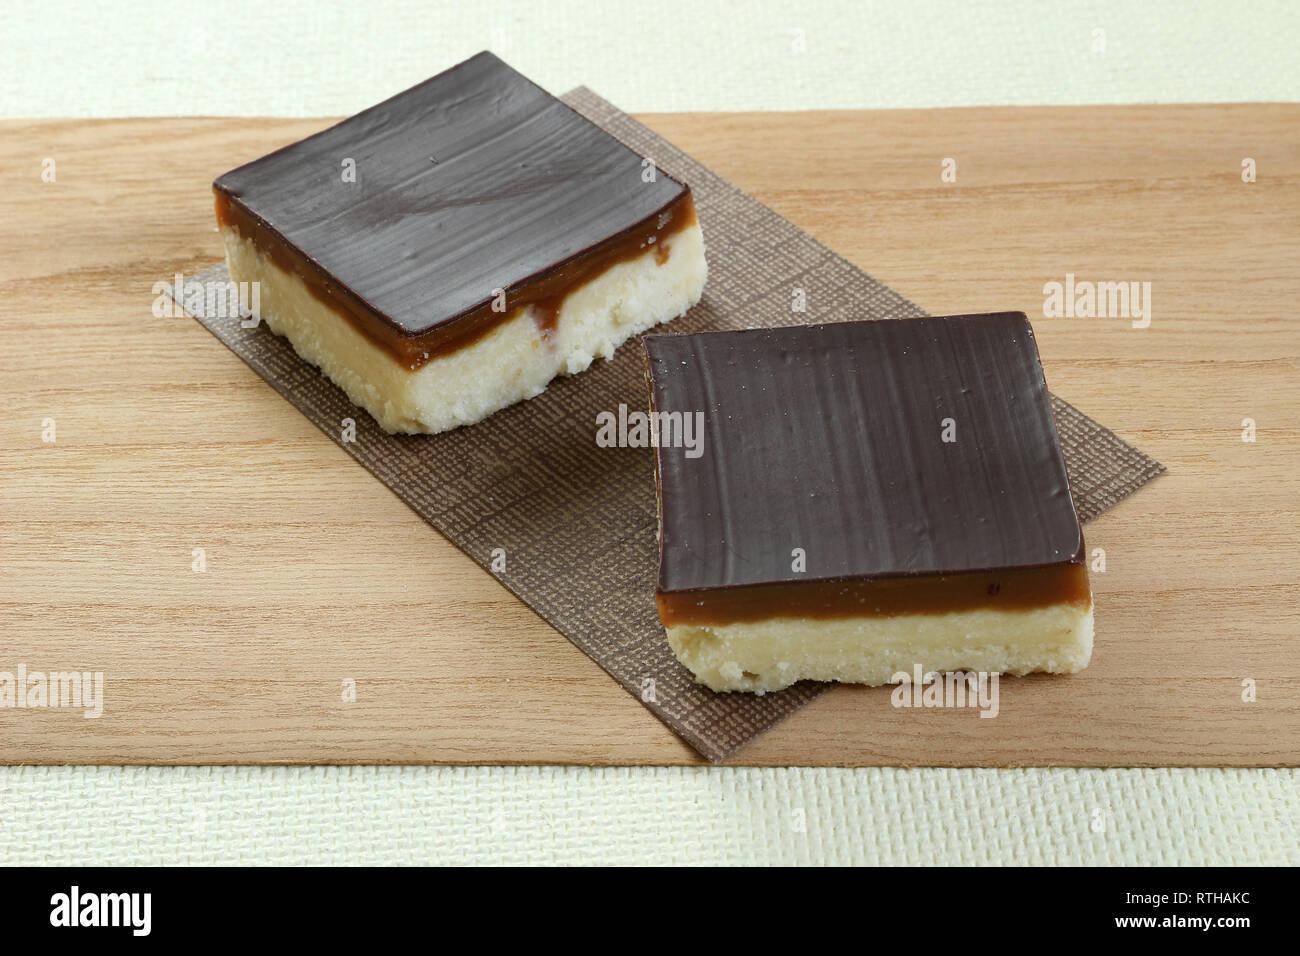 a02086e90c053 Caramel Shortcake Stock Photos & Caramel Shortcake Stock Images - Alamy